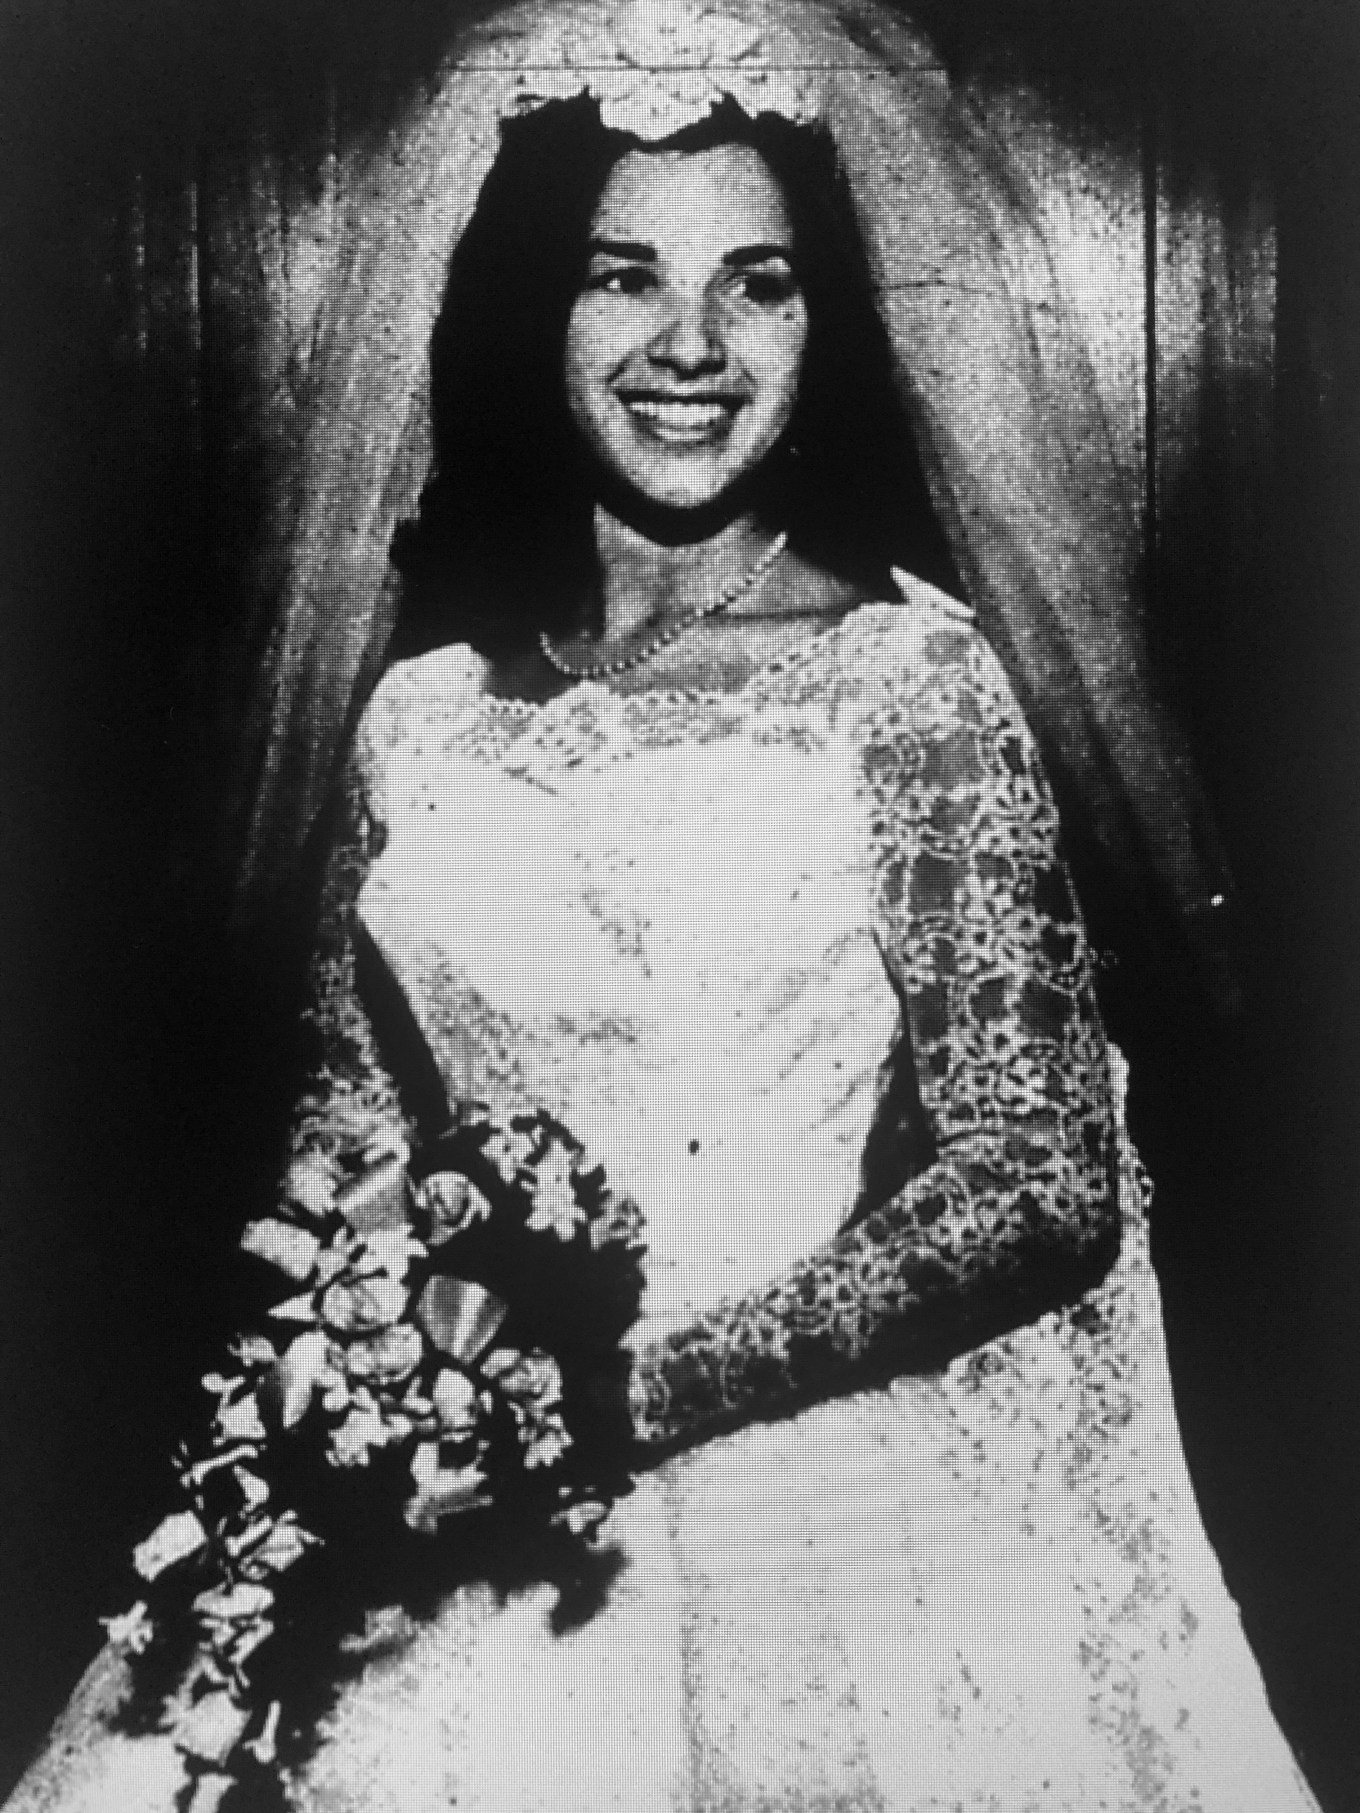 Janet E. Guidoboni weds Donald W. Ganley Jr.